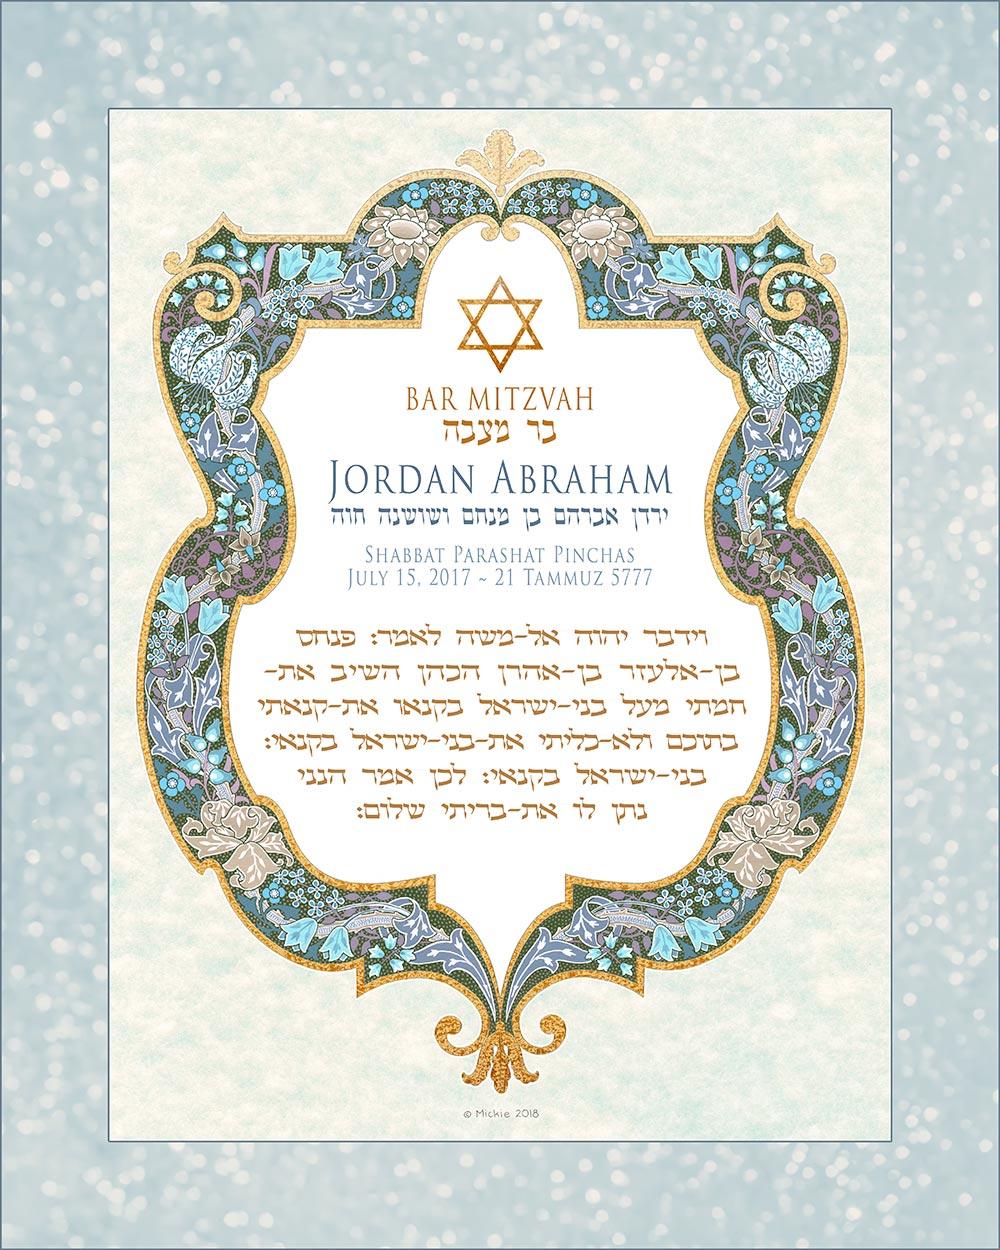 Personalized Bar Mitzvah Shield of David Parasha Certificate